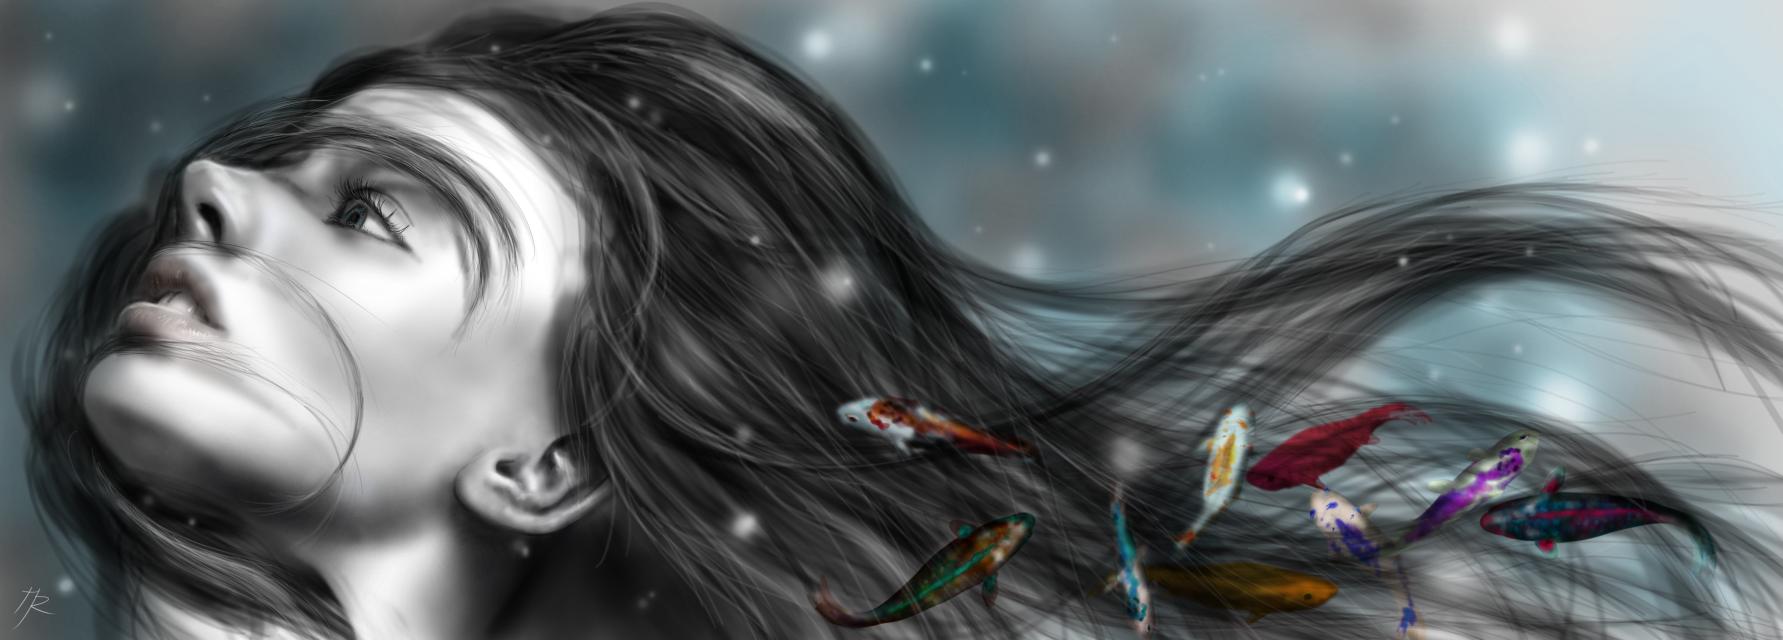 Drawn with Krita on Microsoft Surface.  #drawing #digitaldrawing #fantasy #digitalpainting